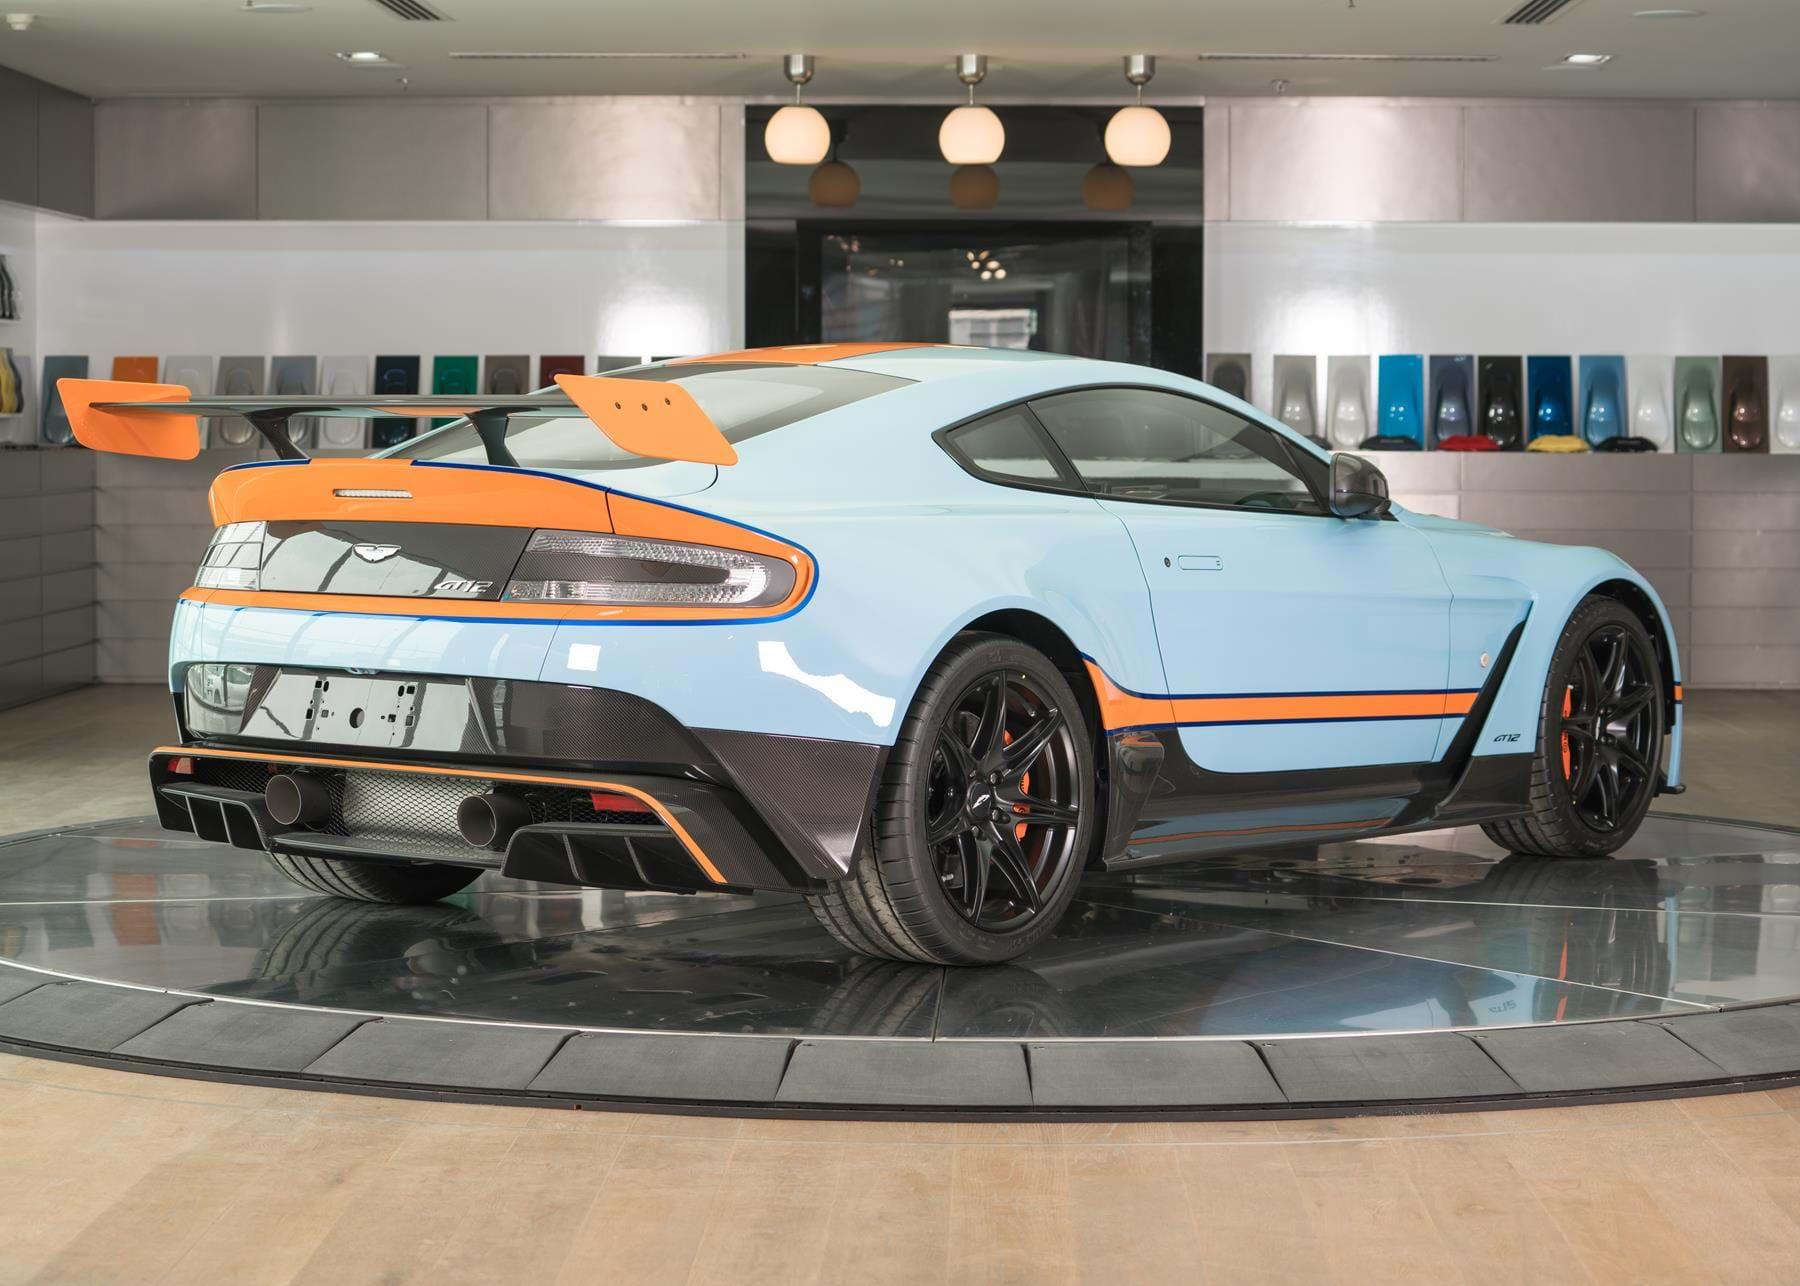 Aston Martin Gt12 Luxury Pulse Cars Swaziland For Sale On Luxurypulse